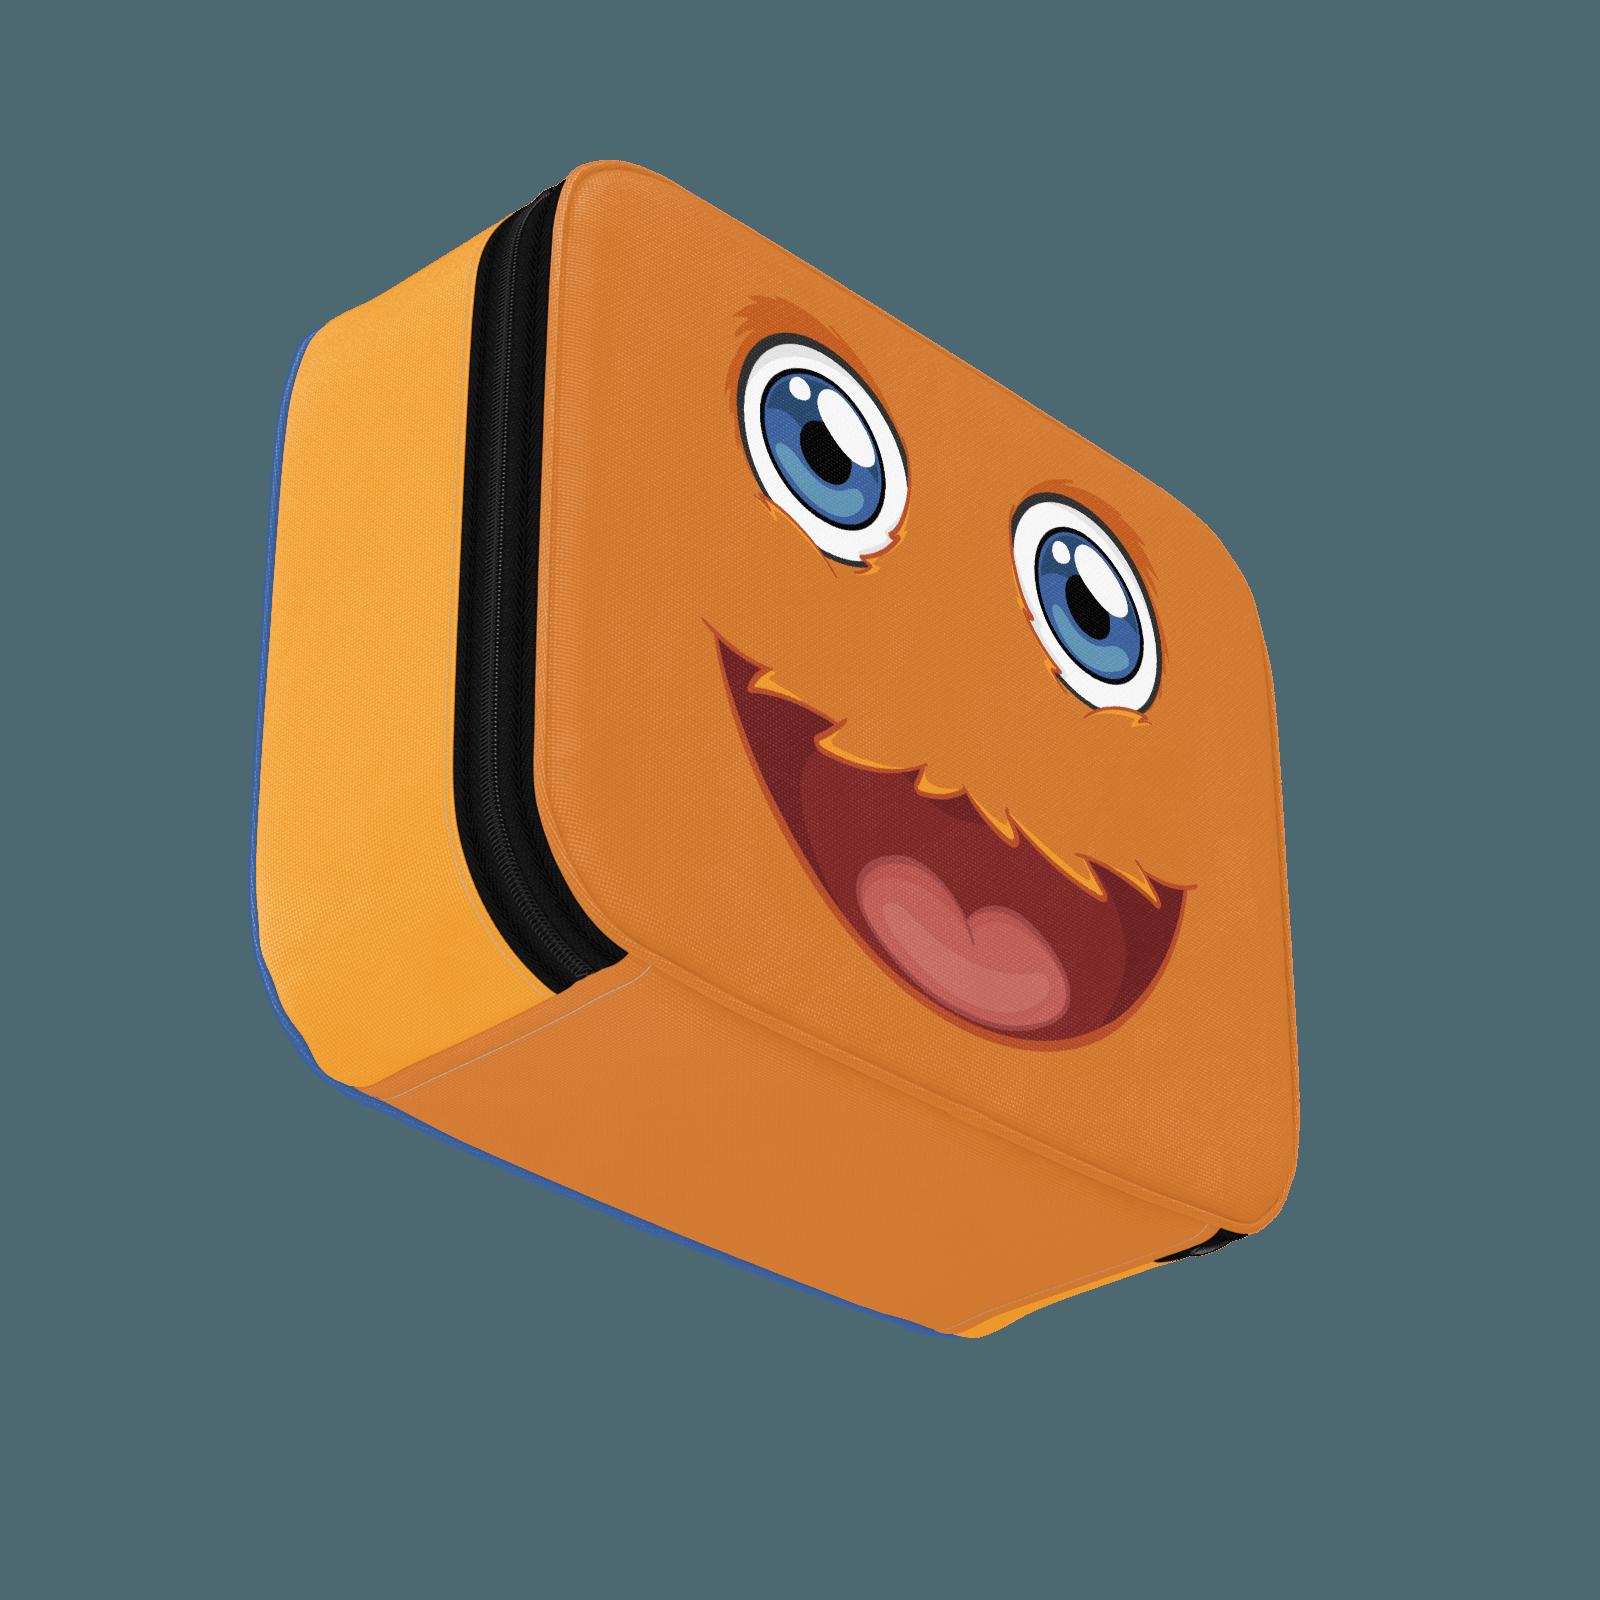 Lunchbox clipart lunch menu. Face box bbtv shop